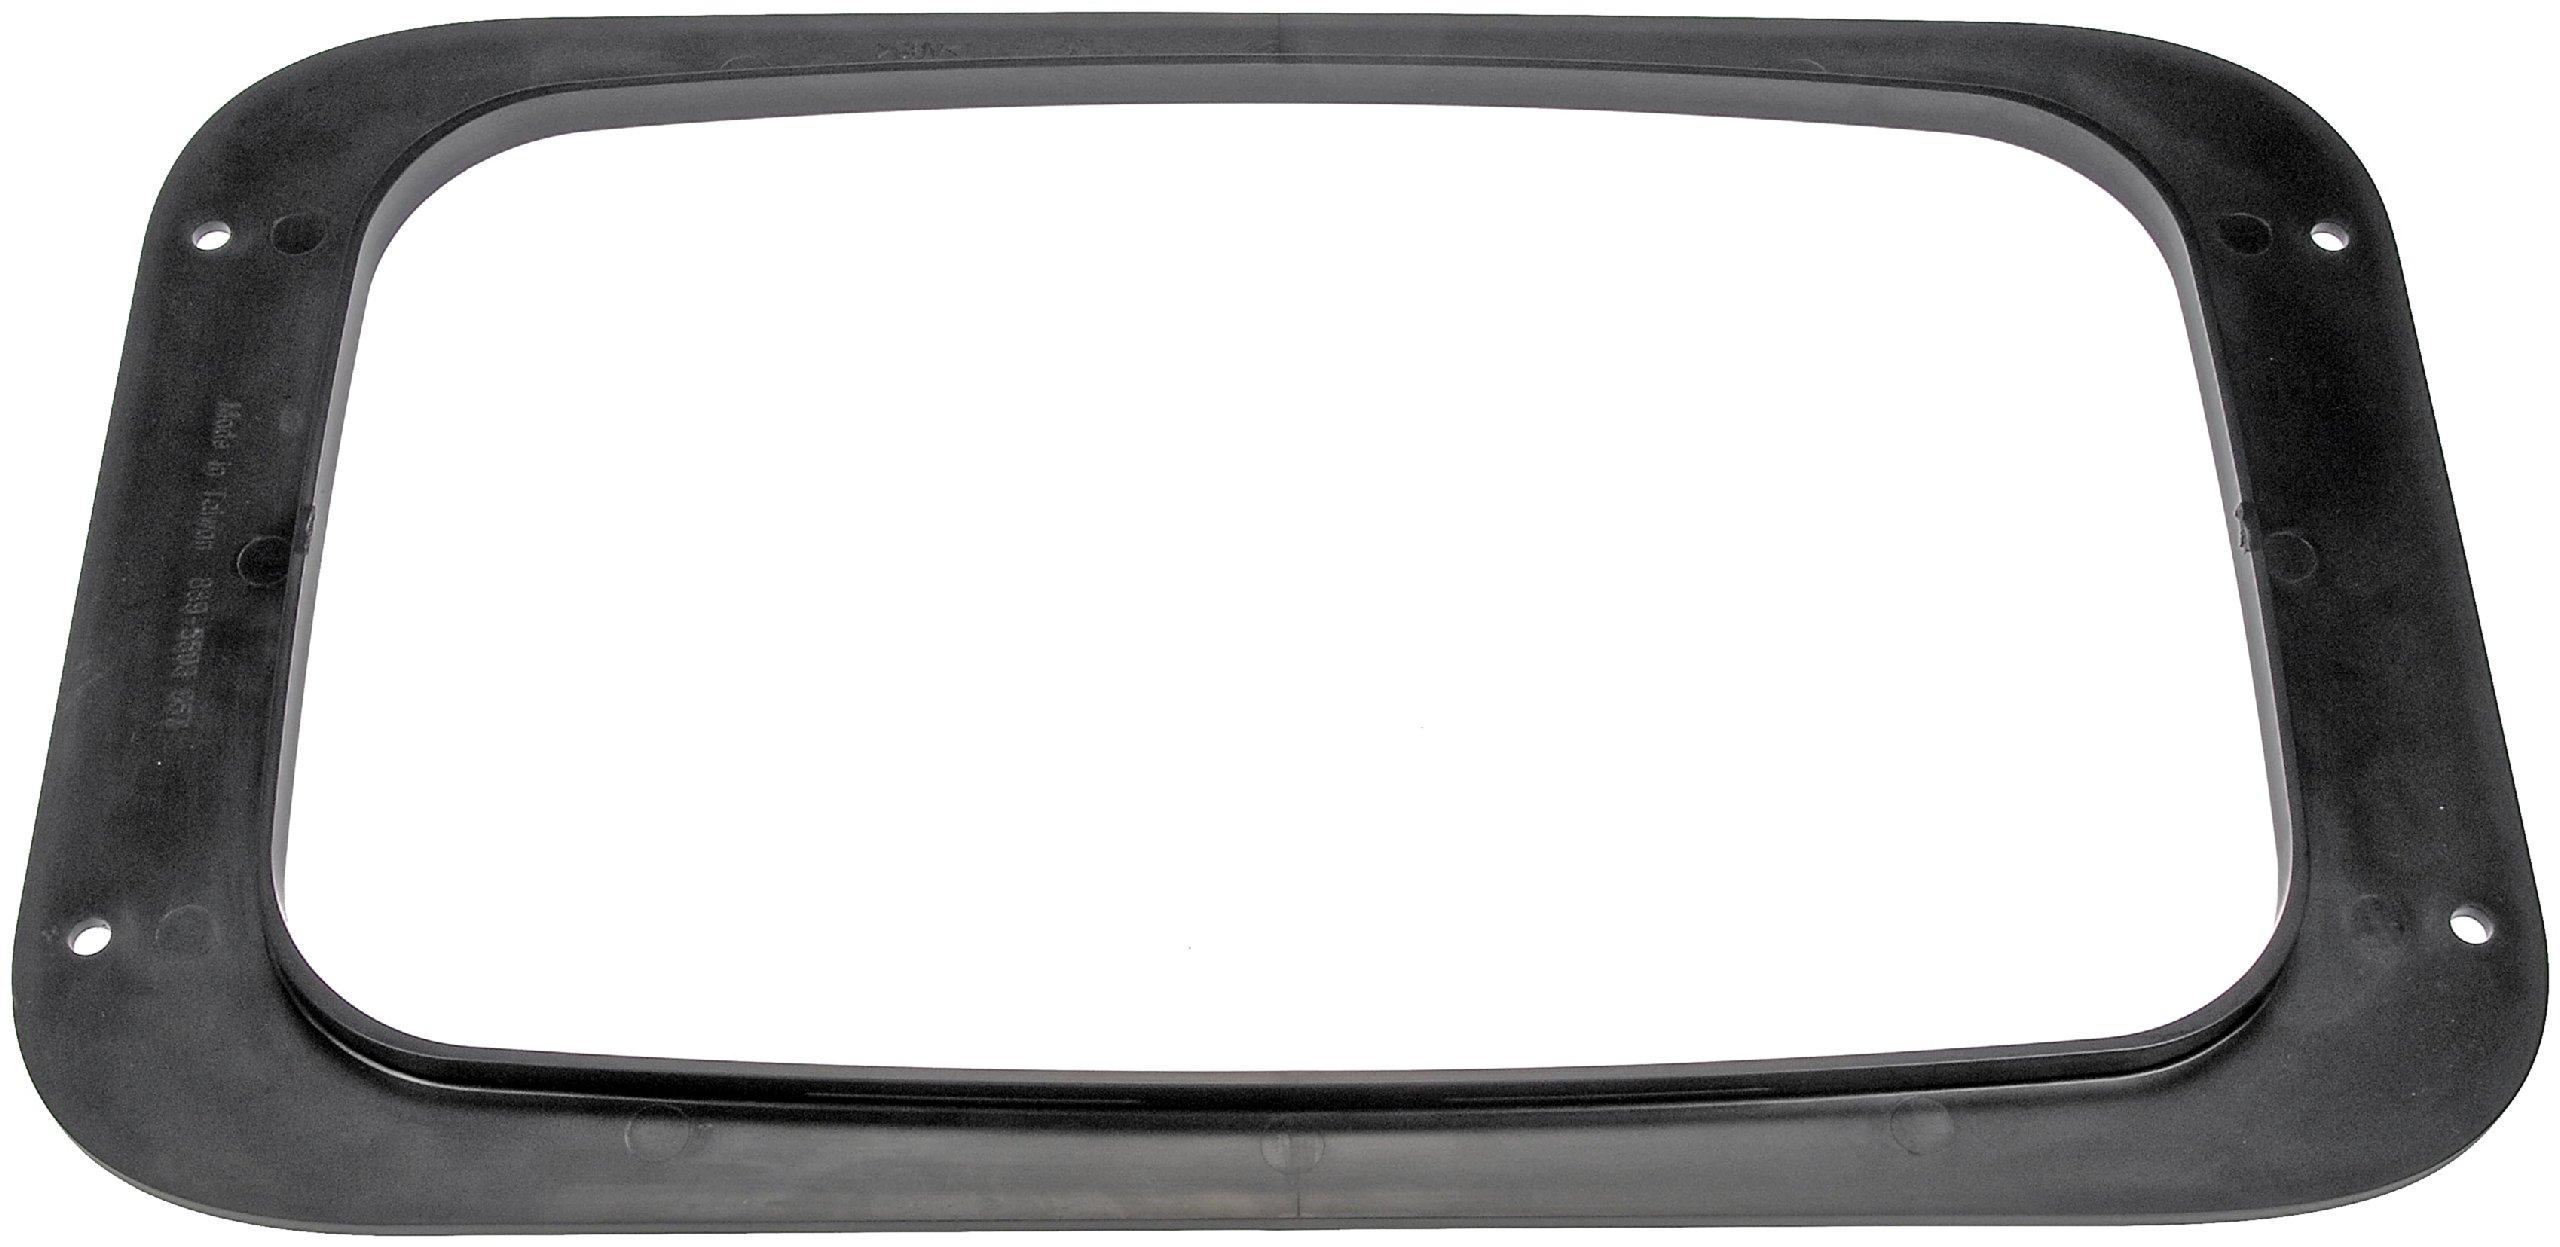 Dorman 889-5503 Mack Headlight Bezel